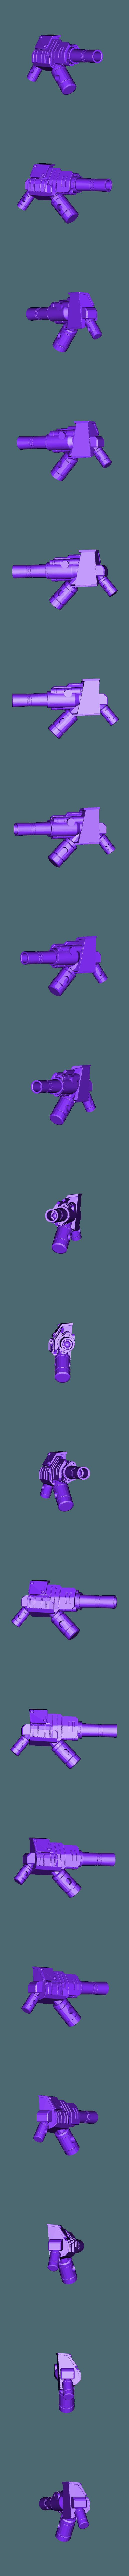 8Storm_Surge_gun_pod_GunX2.obj Download free OBJ file Tempest Rush Mech • 3D printer model, Leesedrenfort